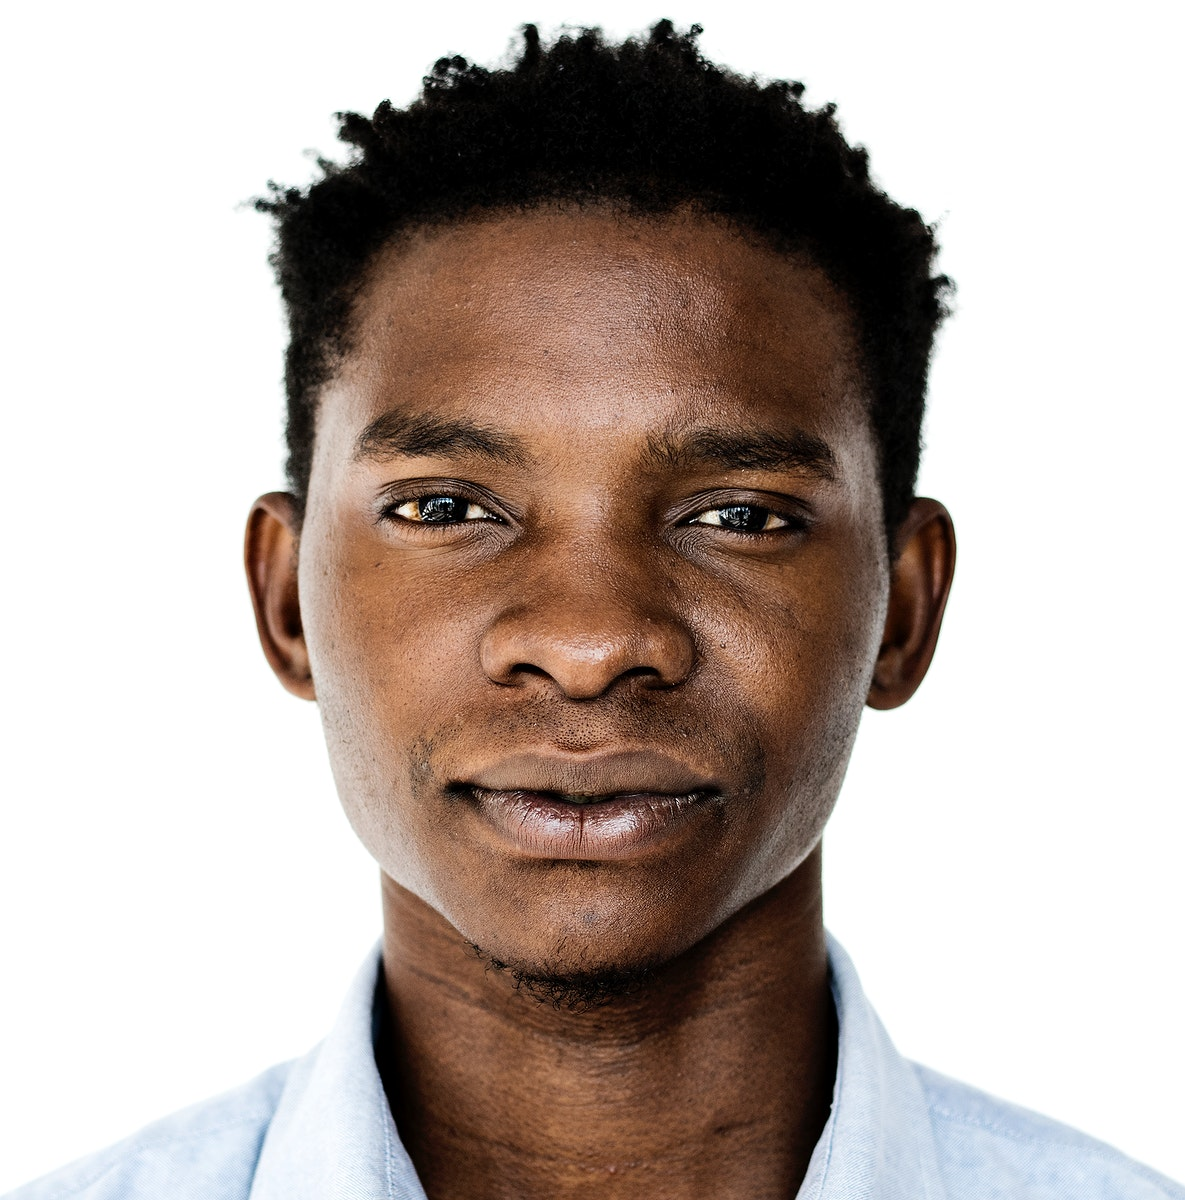 Worldface-Ugandan man in a white background